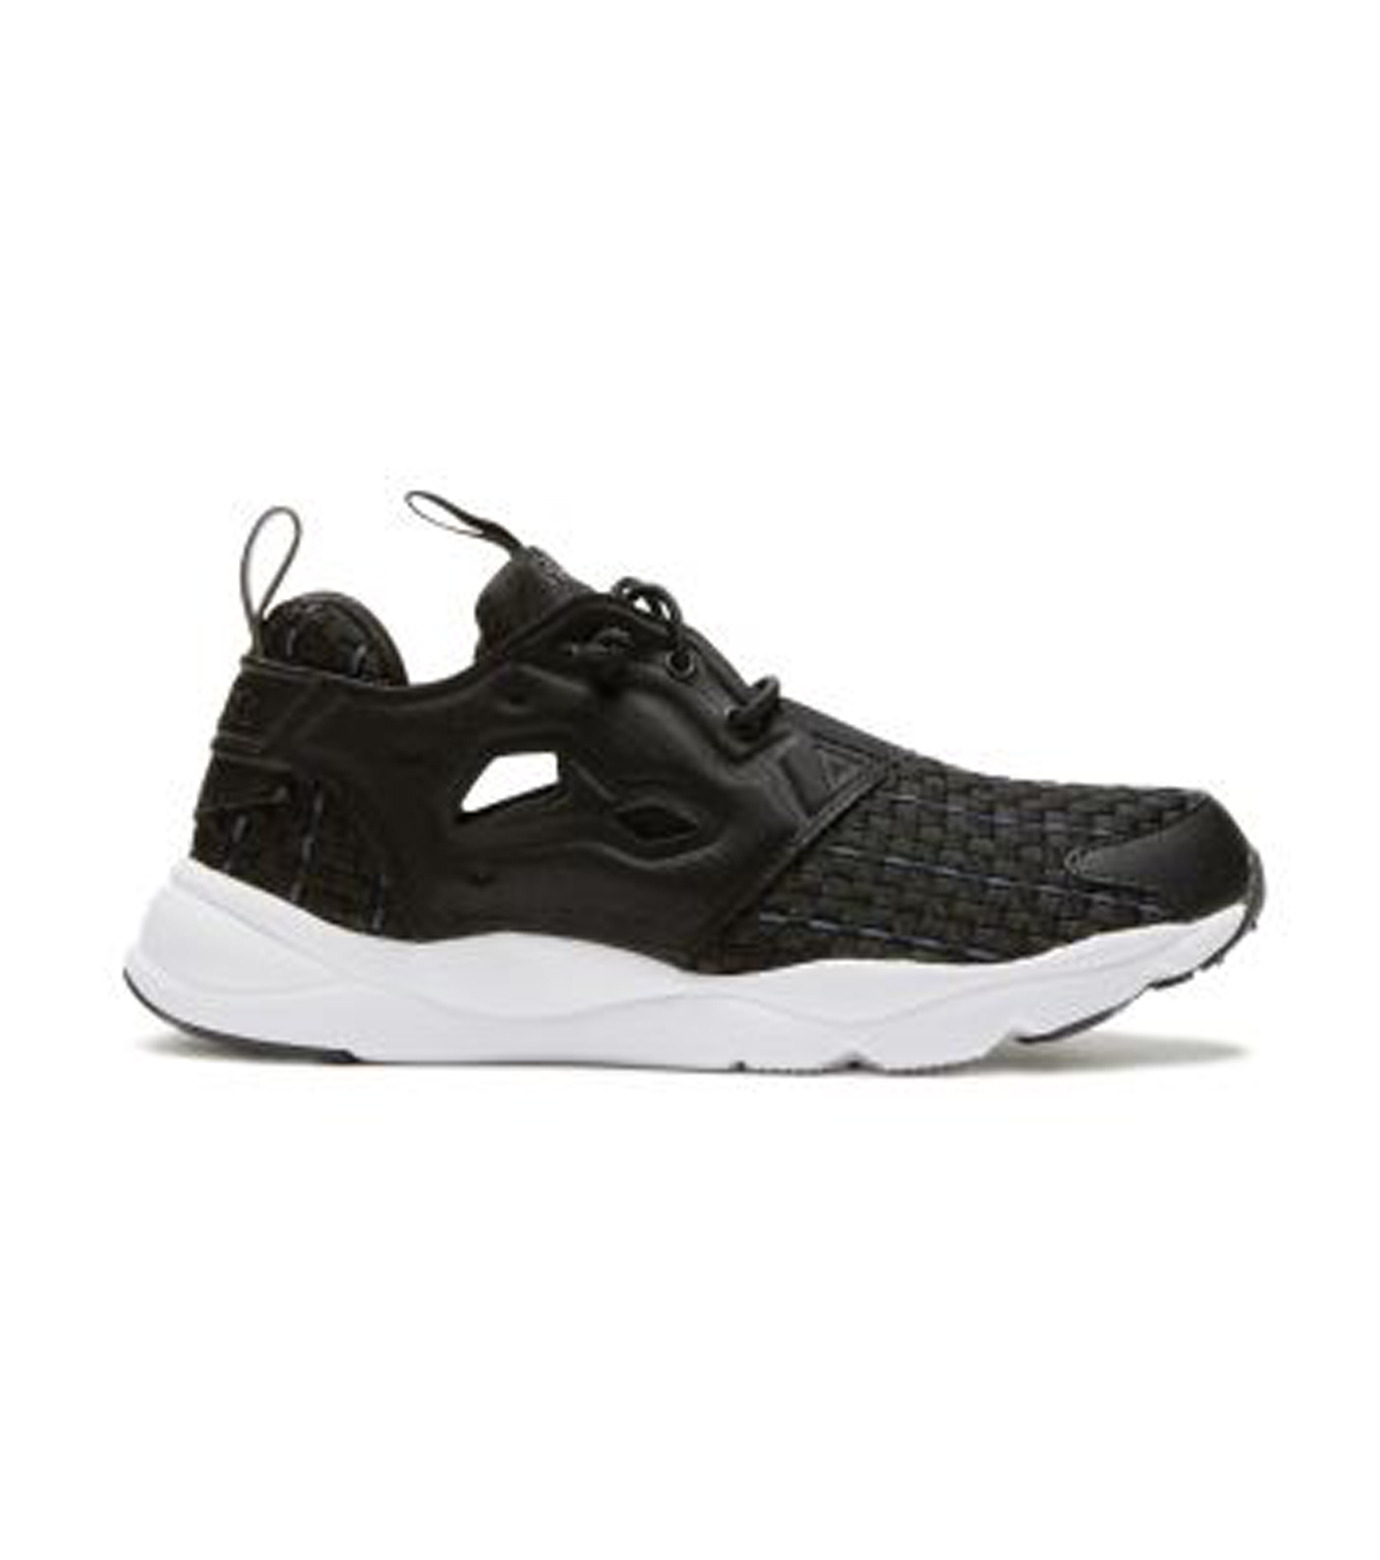 Reebok(リーボック)のFURYLITE NEW WOVEN-BLACK(シューズ/shoes)-V70798-13 拡大詳細画像1